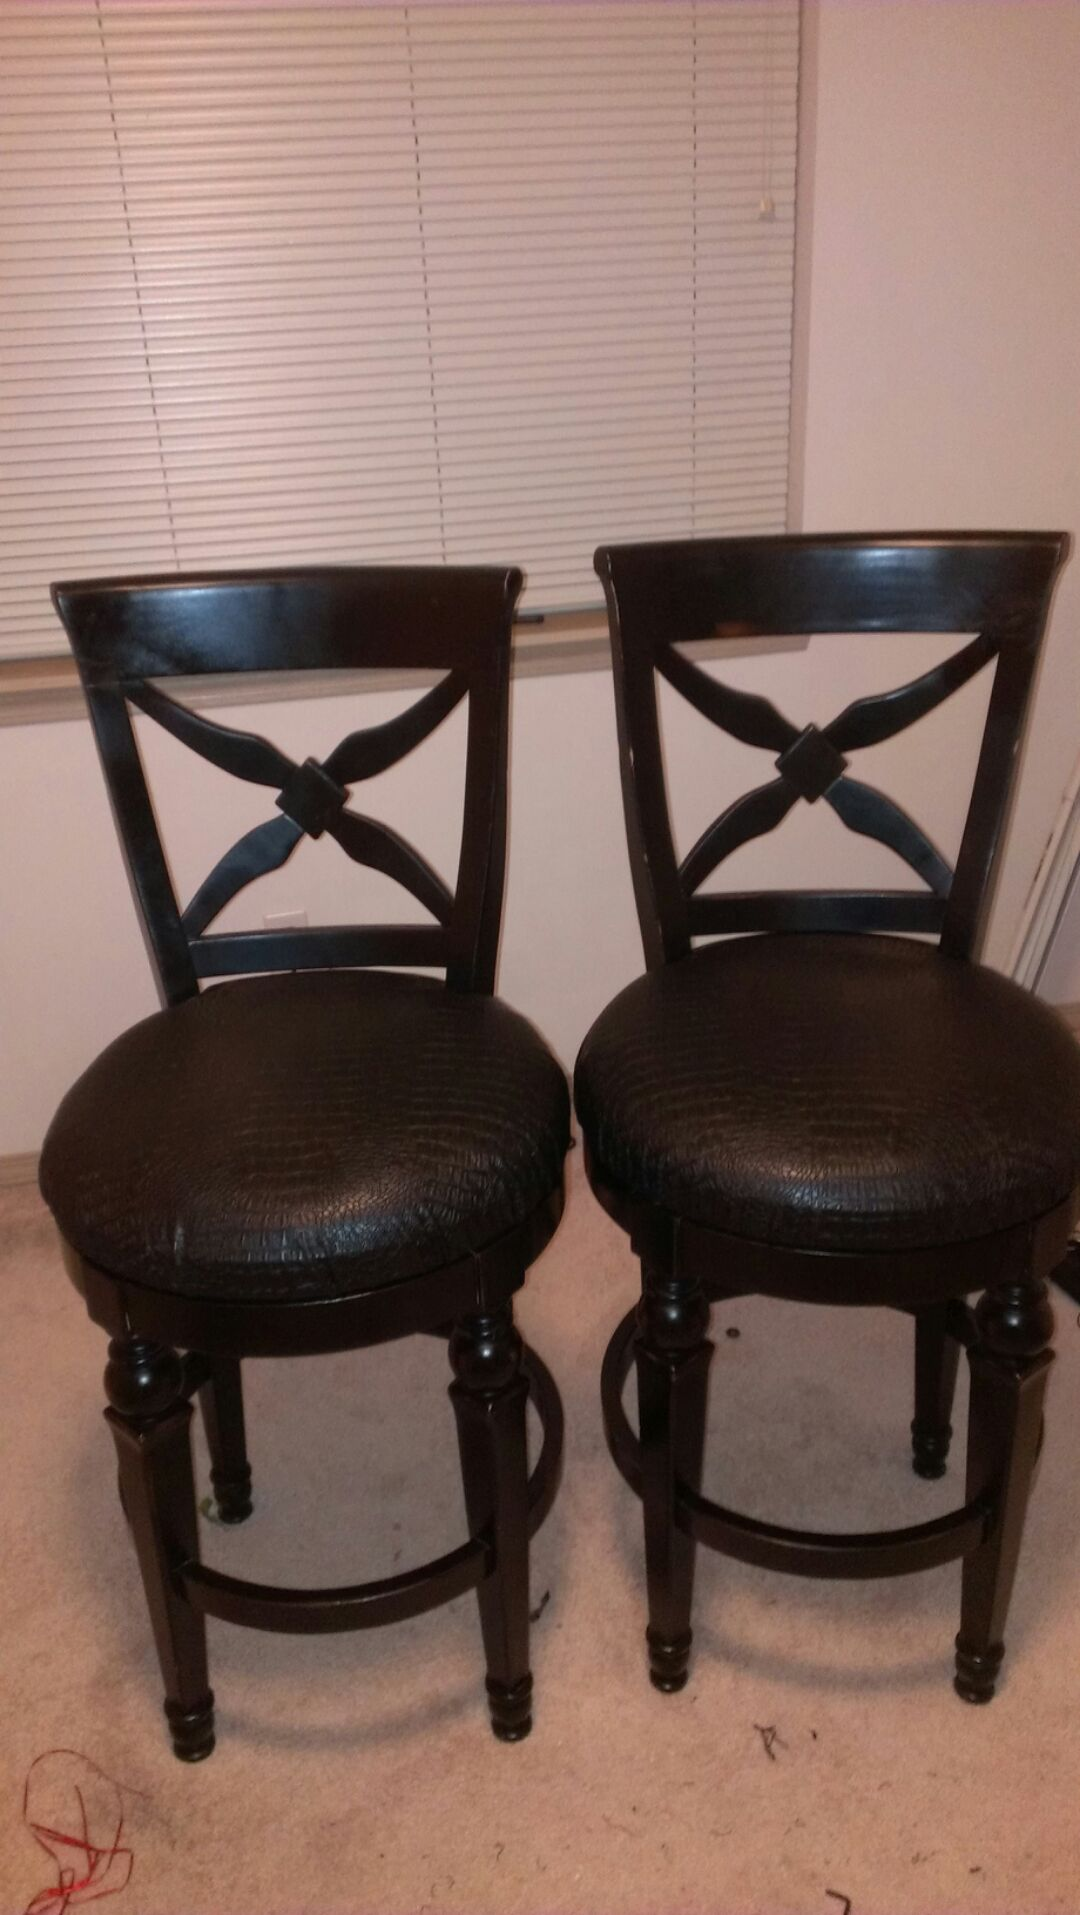 Reupholster Bar Stool Chair